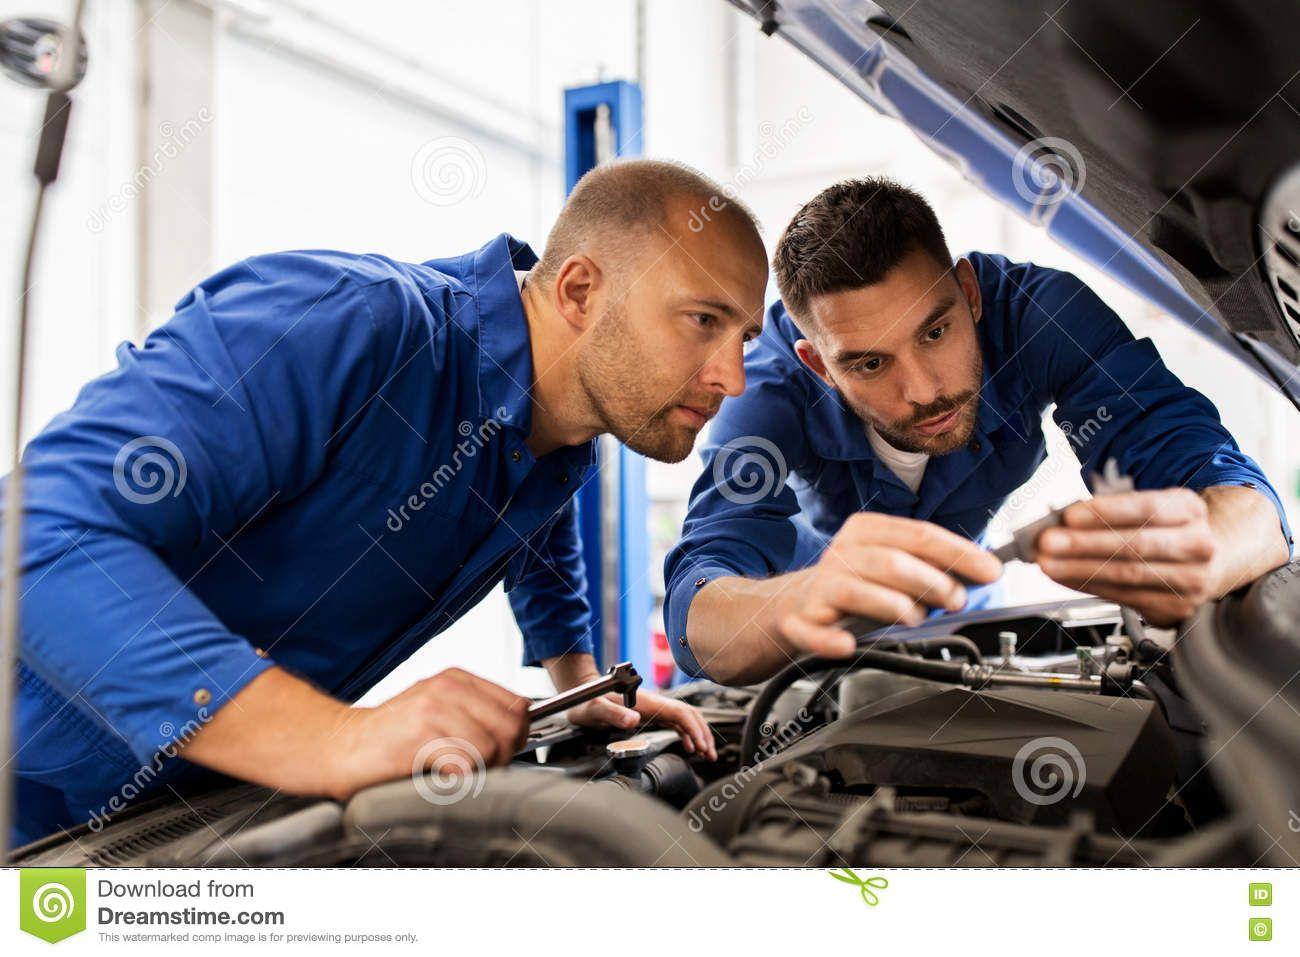 Mechanic Men With Wrench Repairing Car At Workshop Mechanic Man Automotive Technician Mechanic